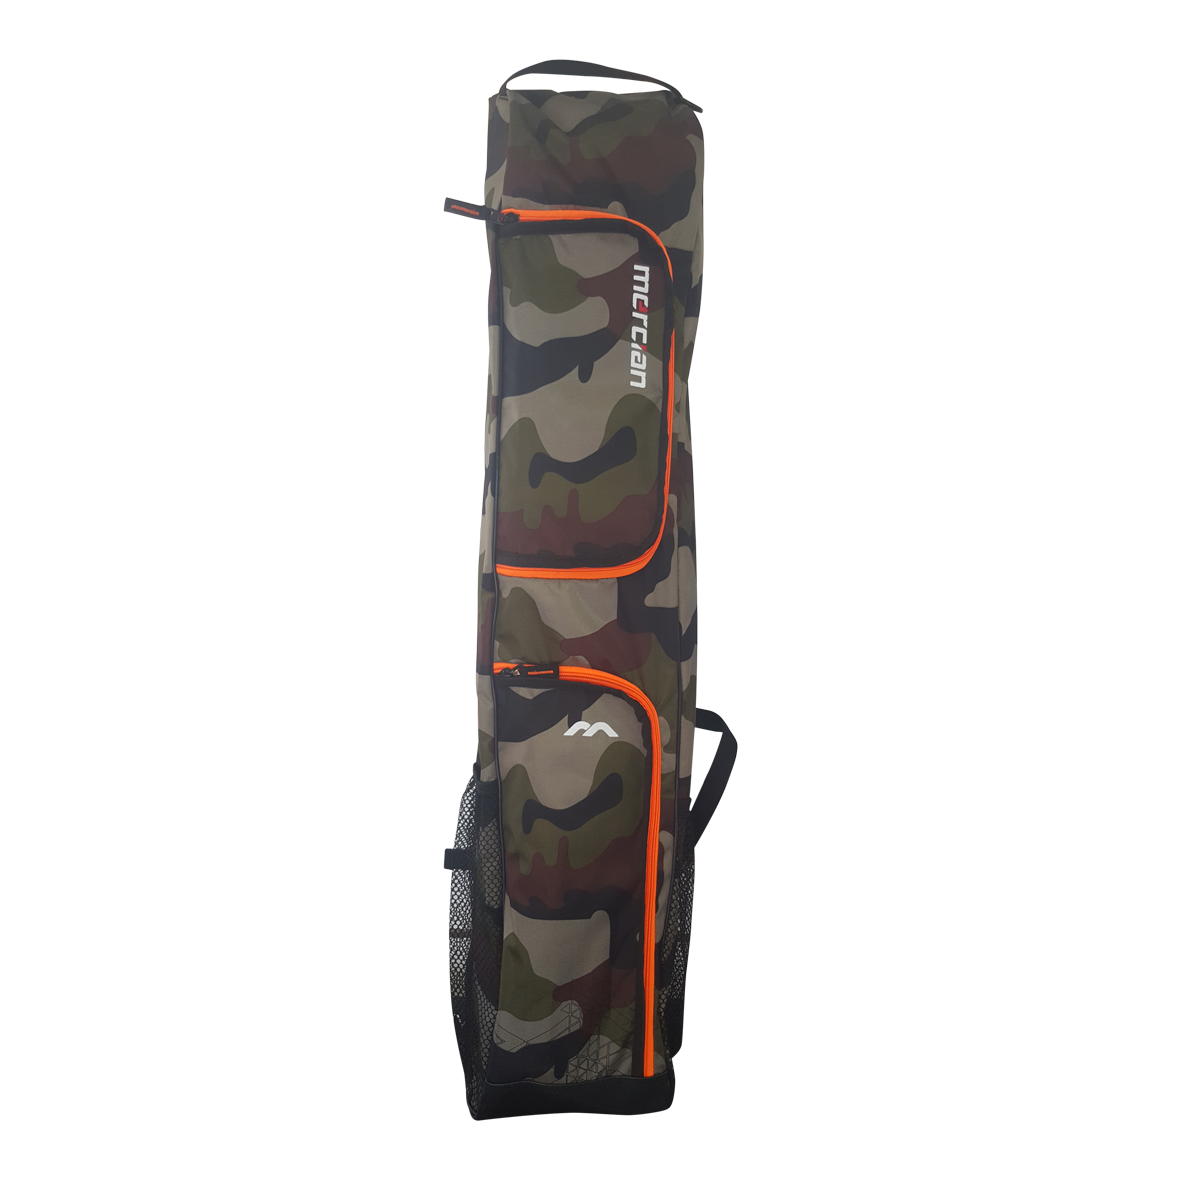 Mercian Genesis 0.2 Stick / Kit Bag 2019